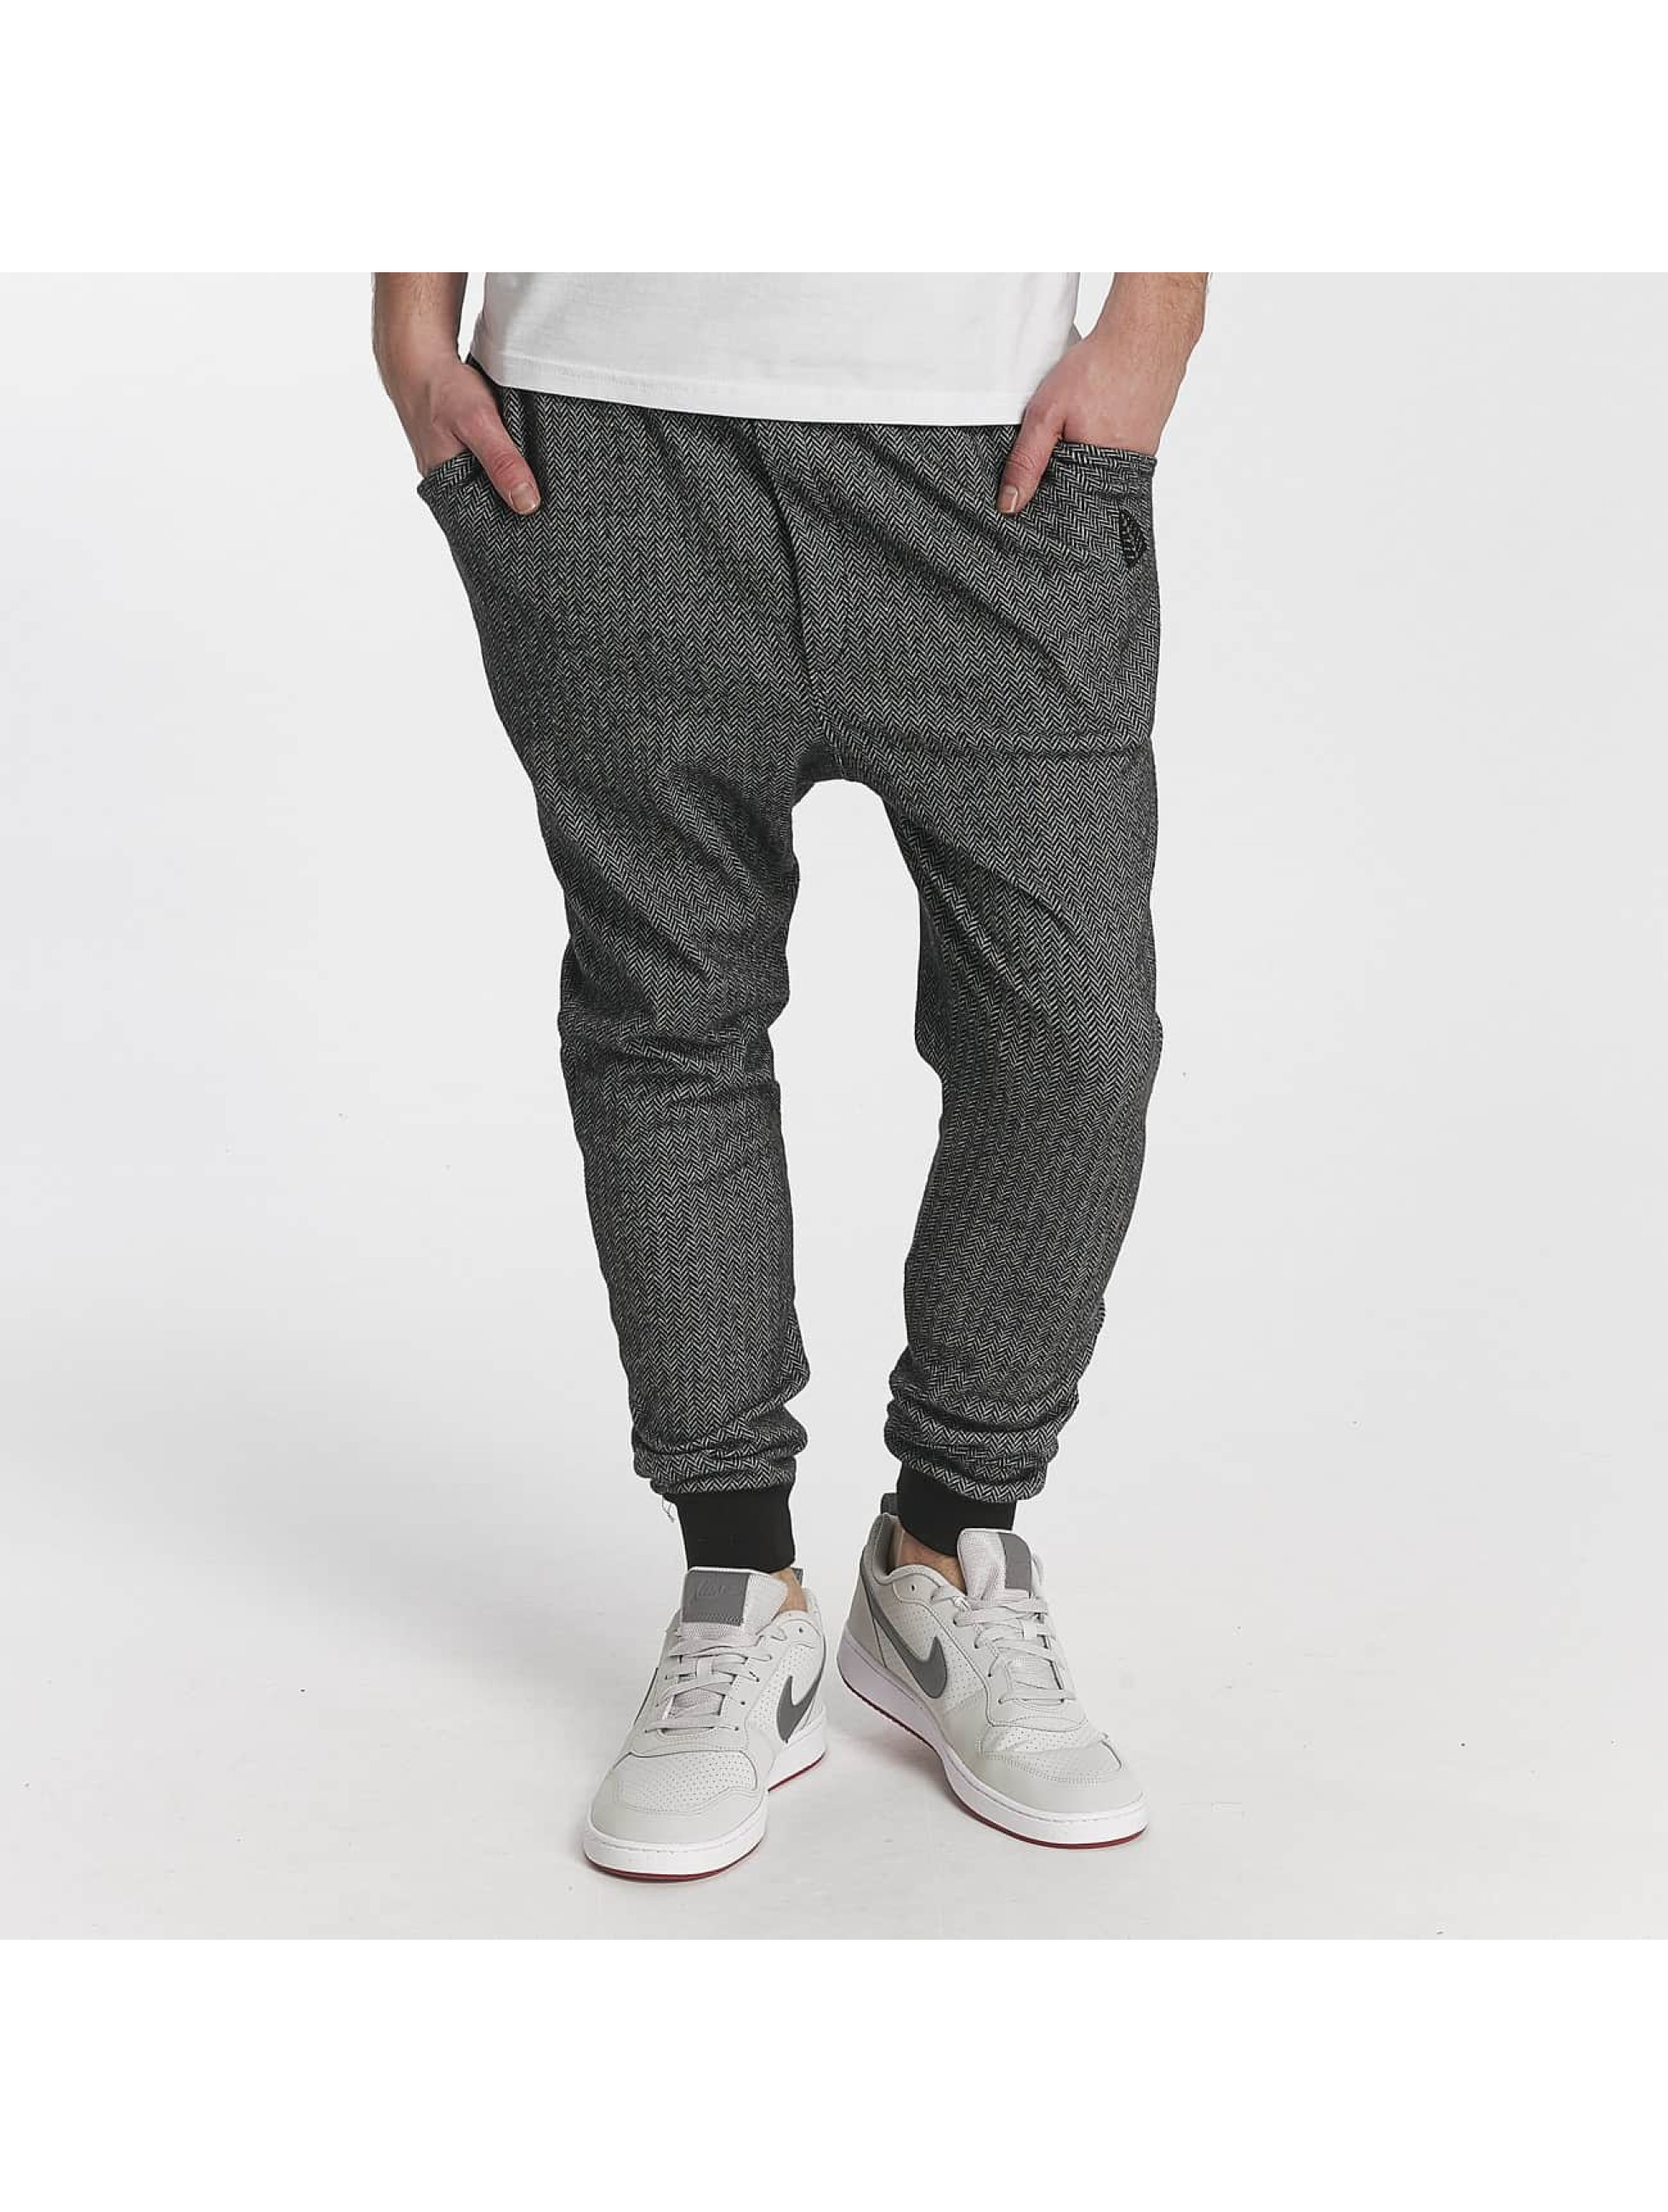 Just Rhyse / Sweat Pant Mountain in grey XL